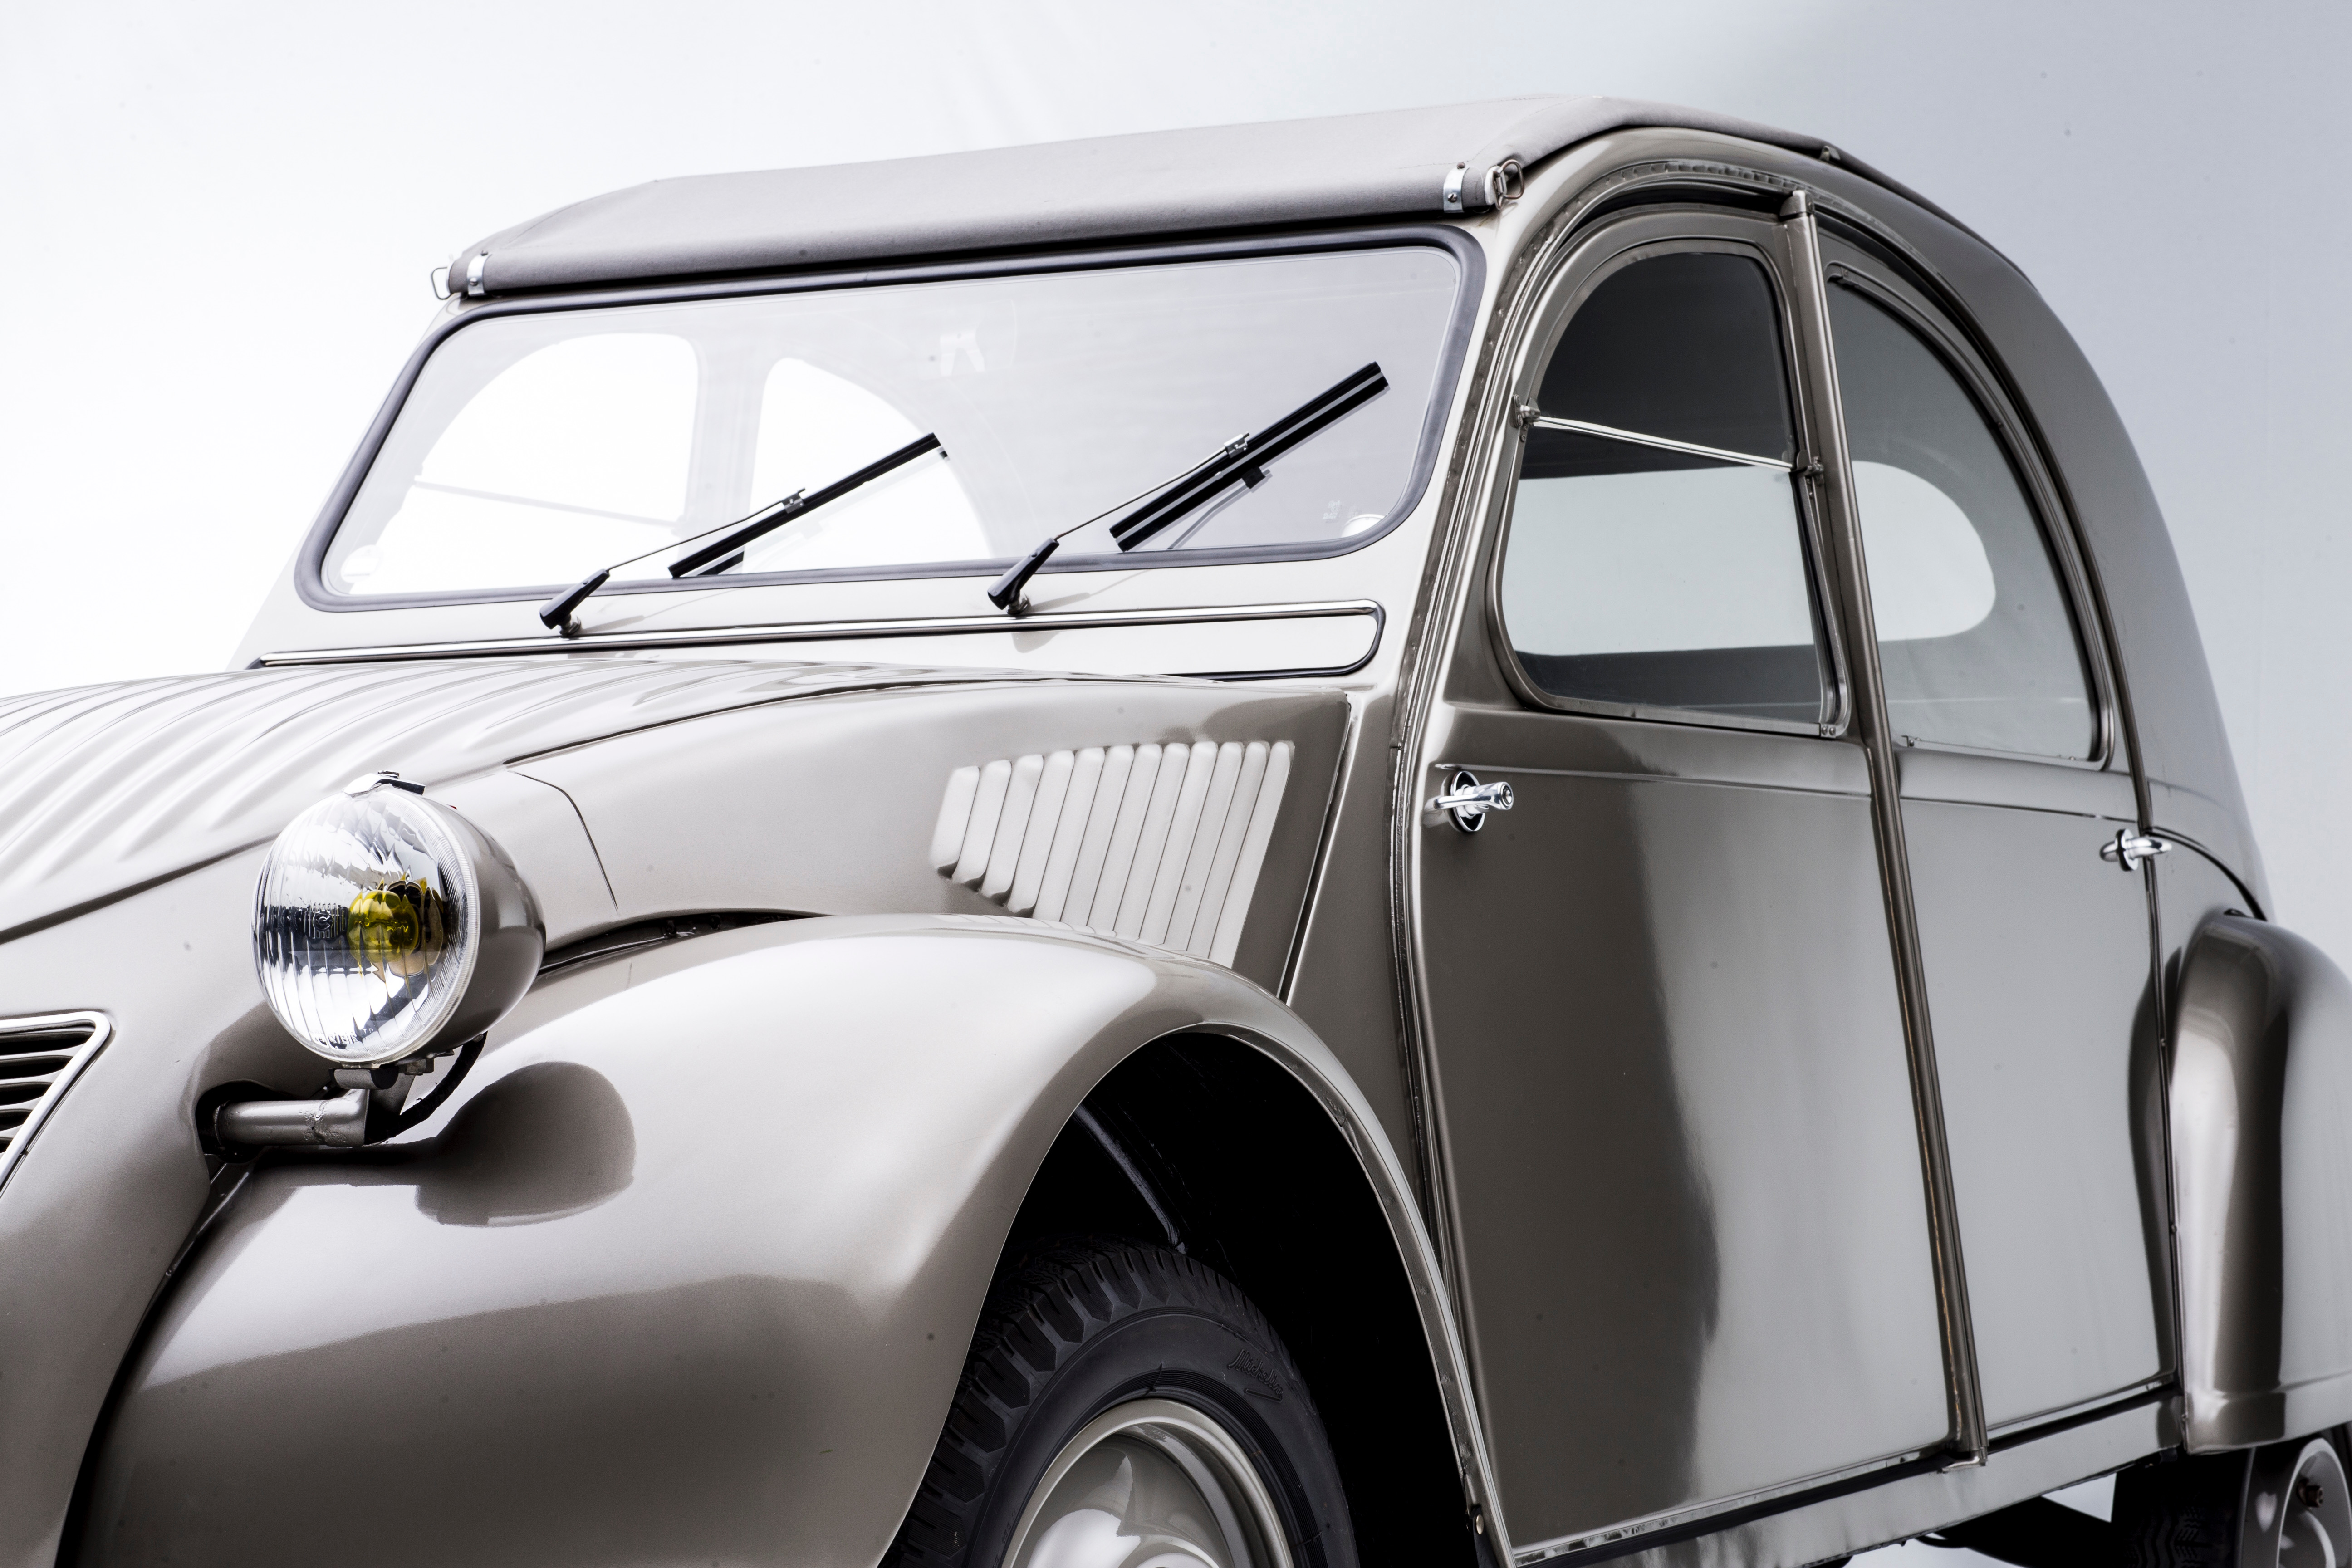 Citroen 2CV, Paris 1948: Citroen introduces the 2CV. Paris 2018: Citroen celebrates the 2CV, ClassicCars.com Journal